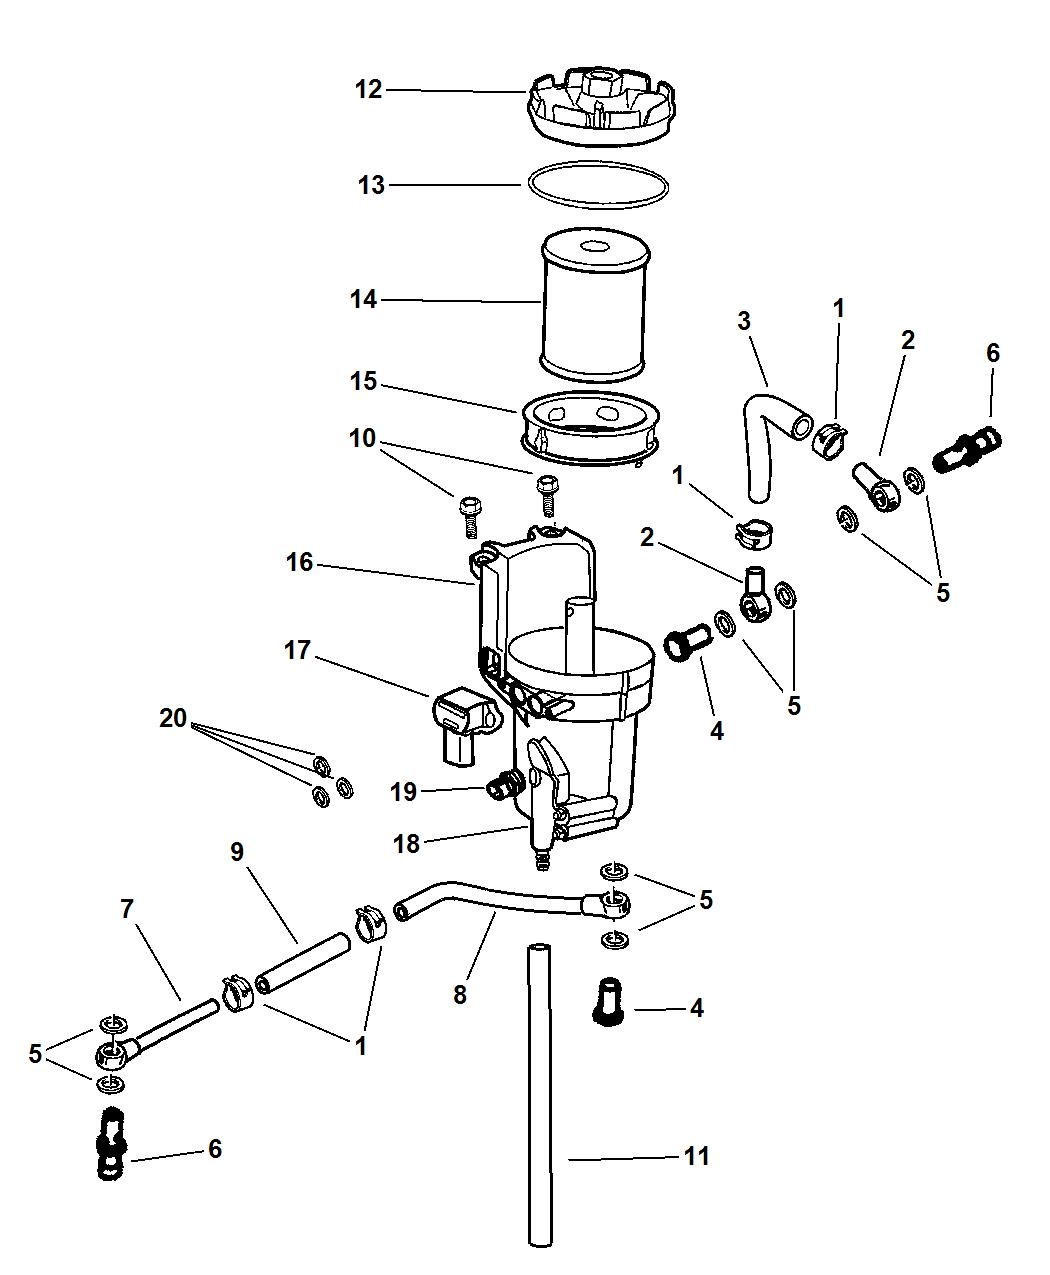 dodge ram 2500 fuel filter diagram - 1960 ford ranchero wiring harness -  1994-chevys.fordwire.warmi.fr  wiring diagram resource